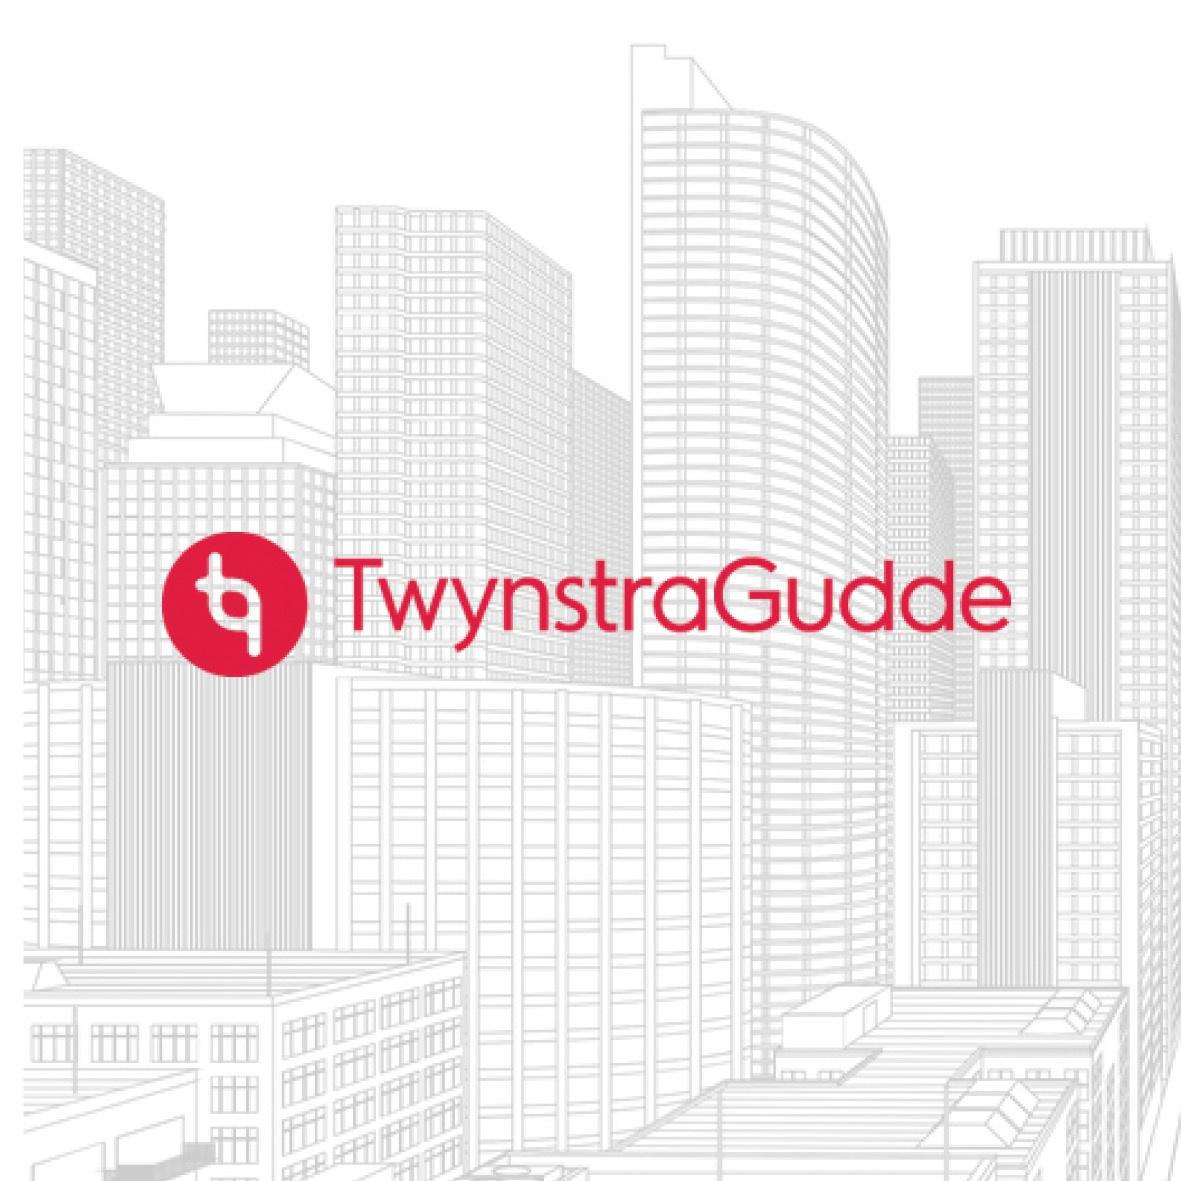 Twynstragudde Logo Website